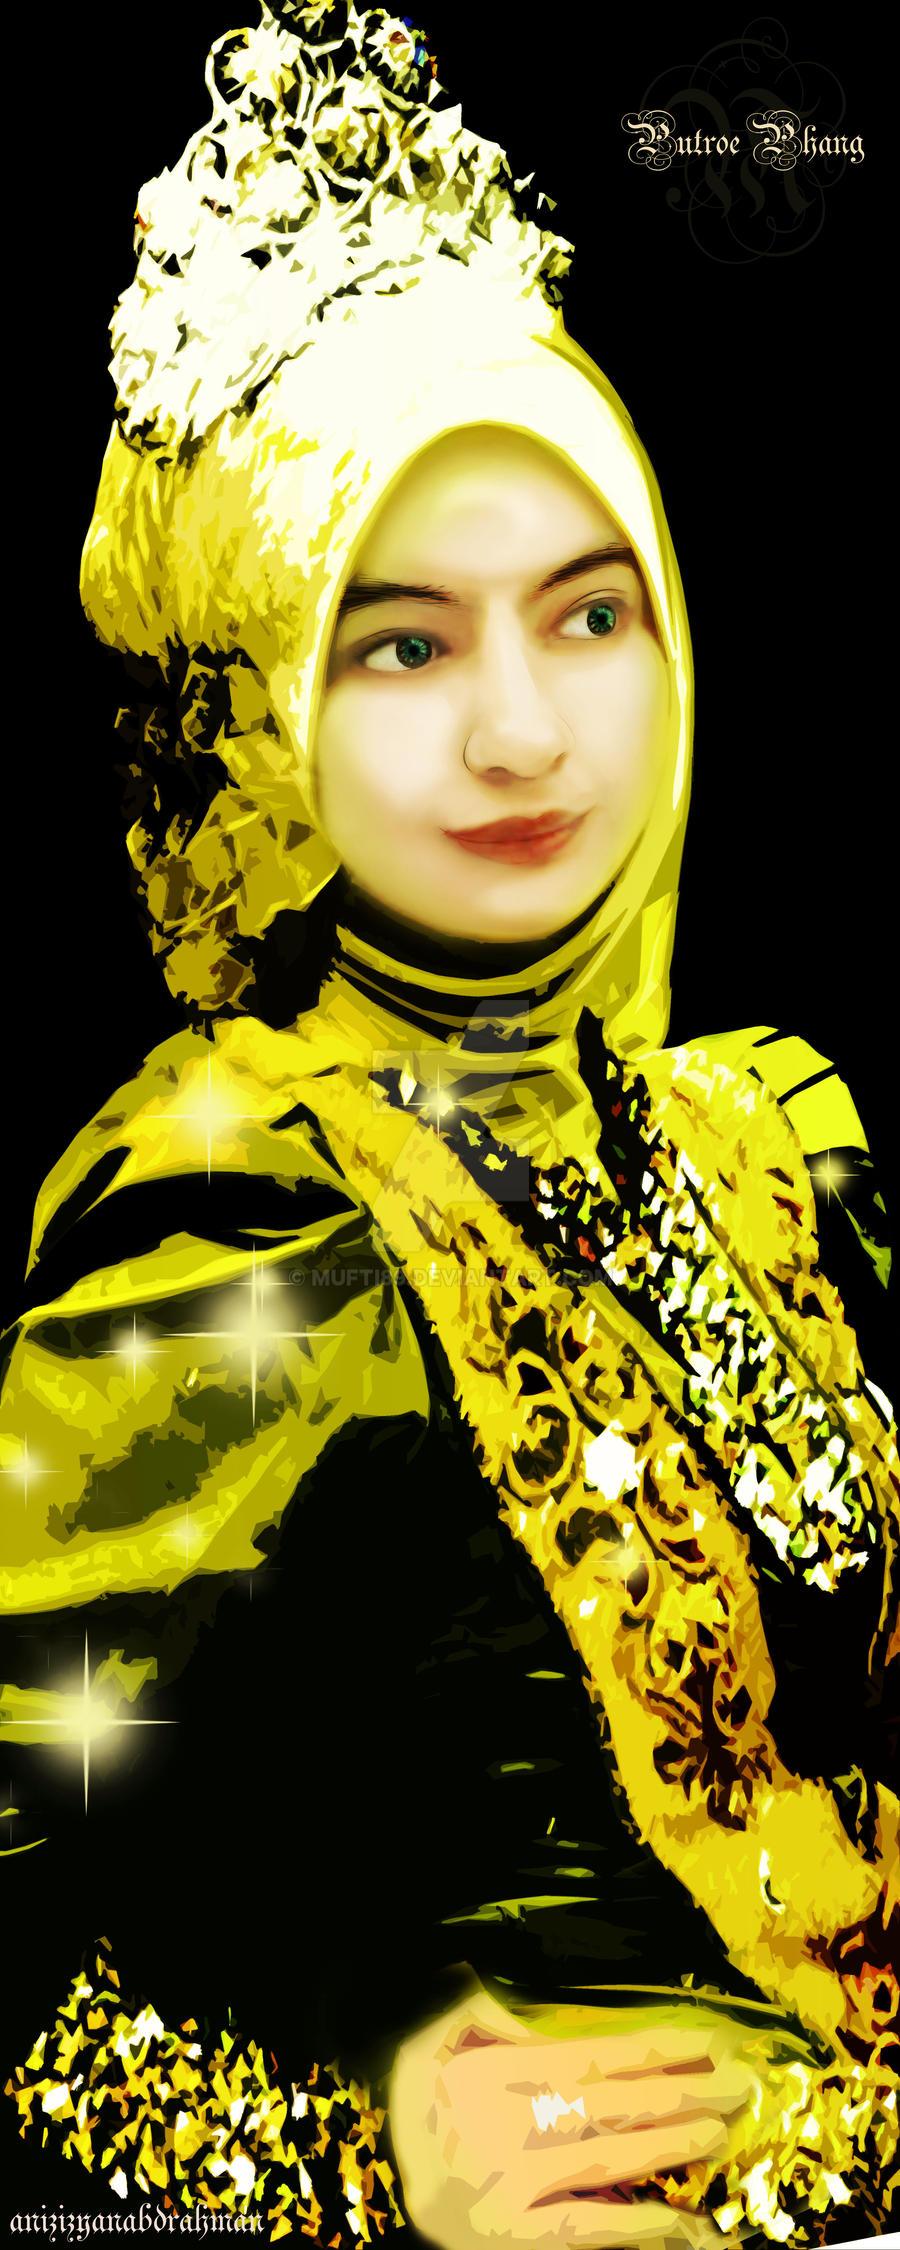 Putroe Phang by mufti89